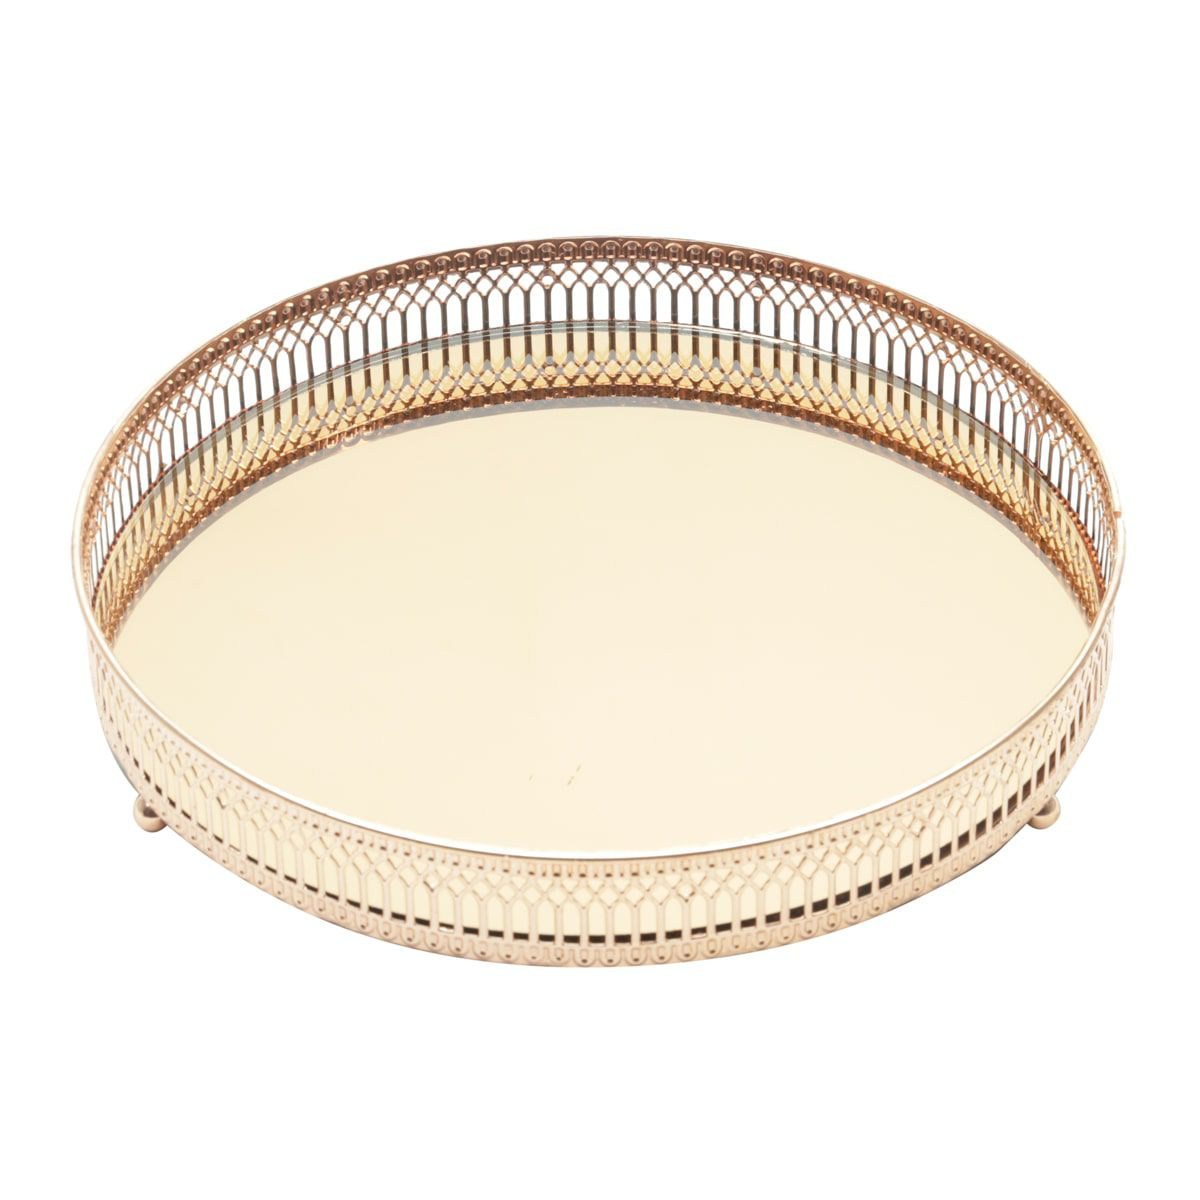 Bandeja Espelhada de Metal Redonda Rose Gold - Luxo para Lavabo / Bar / Sala